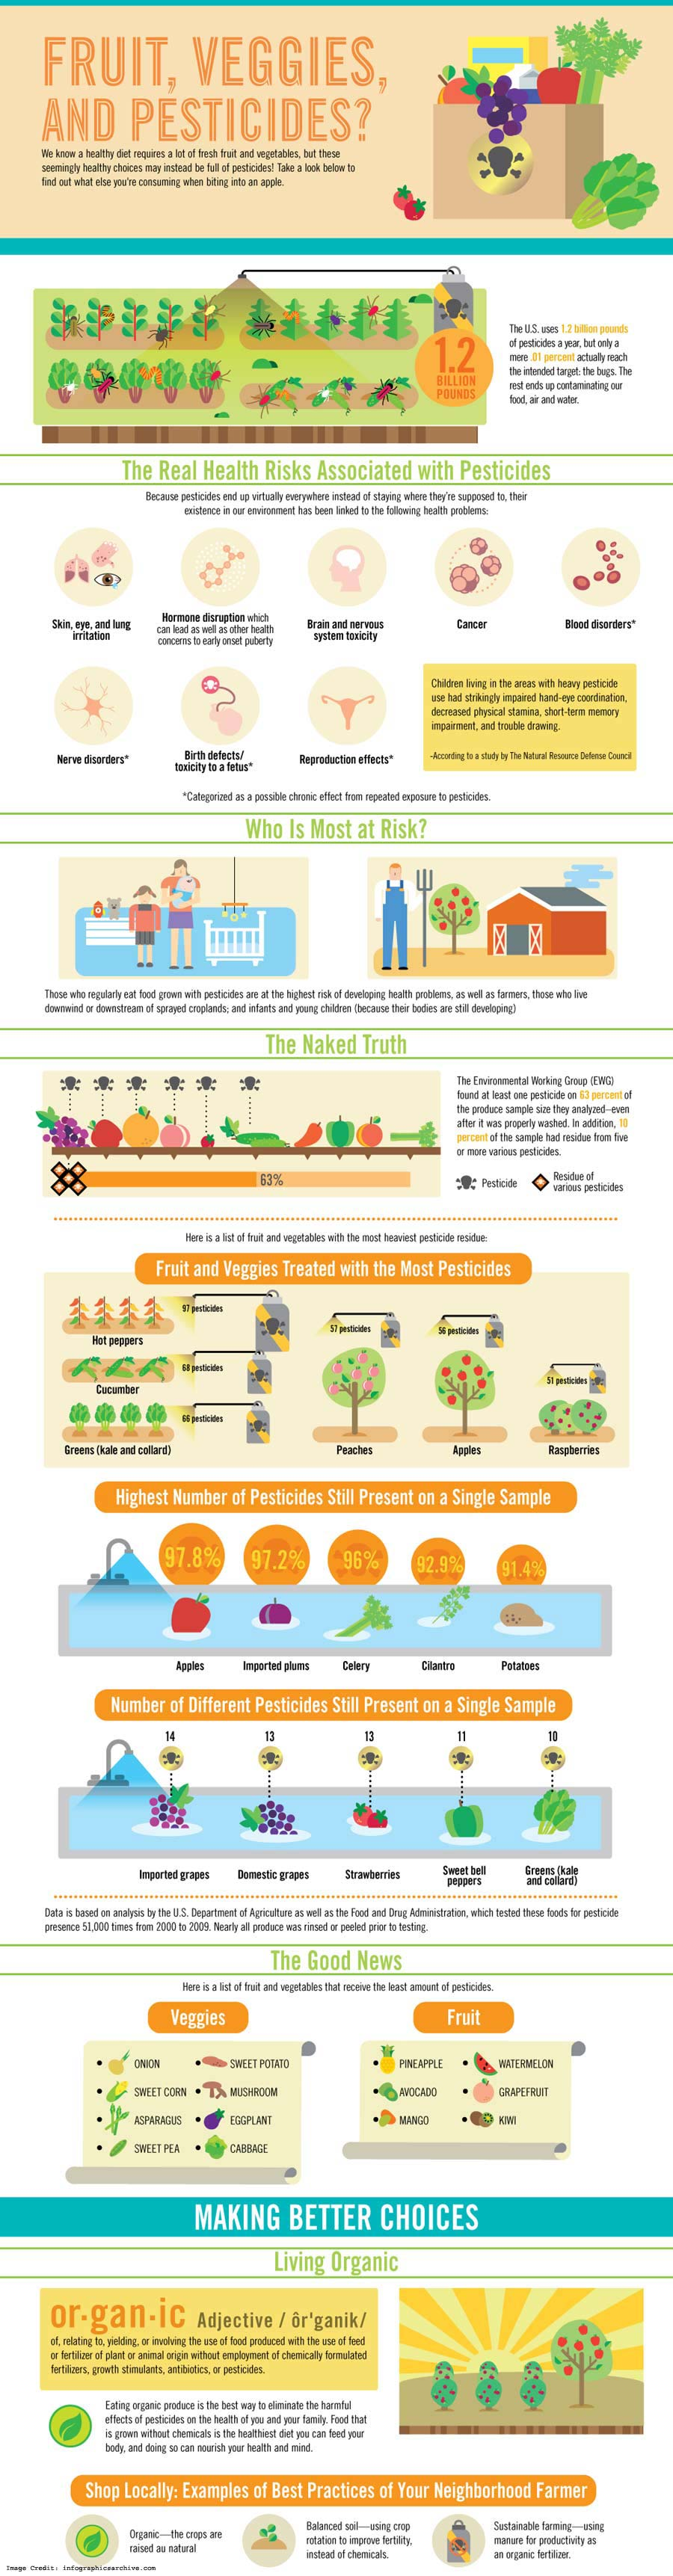 Veggies and Pest Info